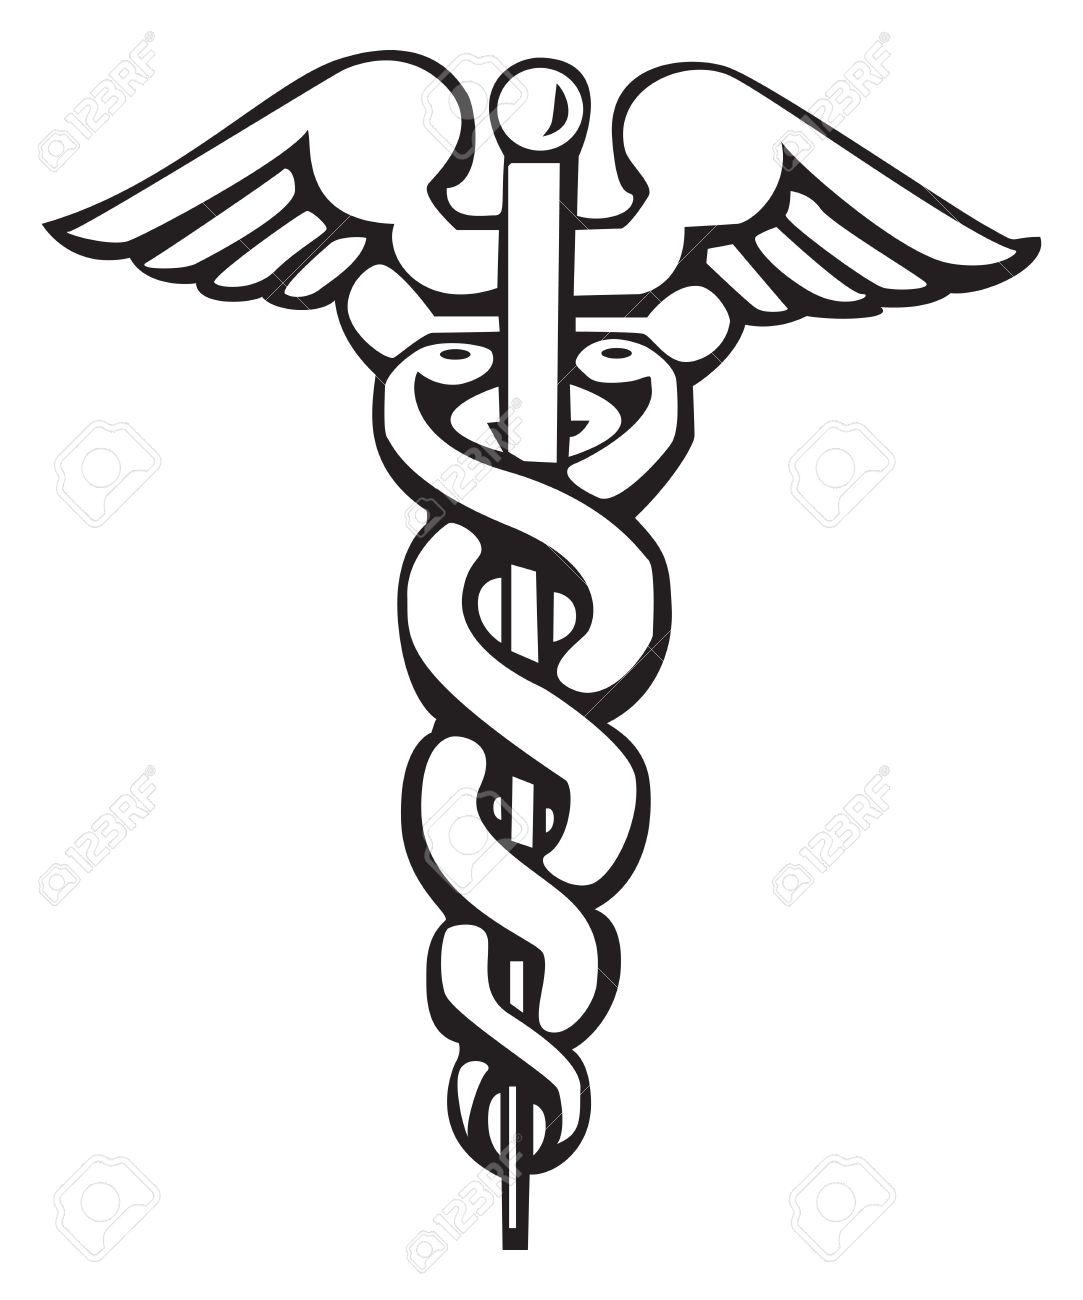 Caduceo Signo Griego Simbolo Para El Tatuaje O La Ilustracion - Simbolos-para-tatuaje